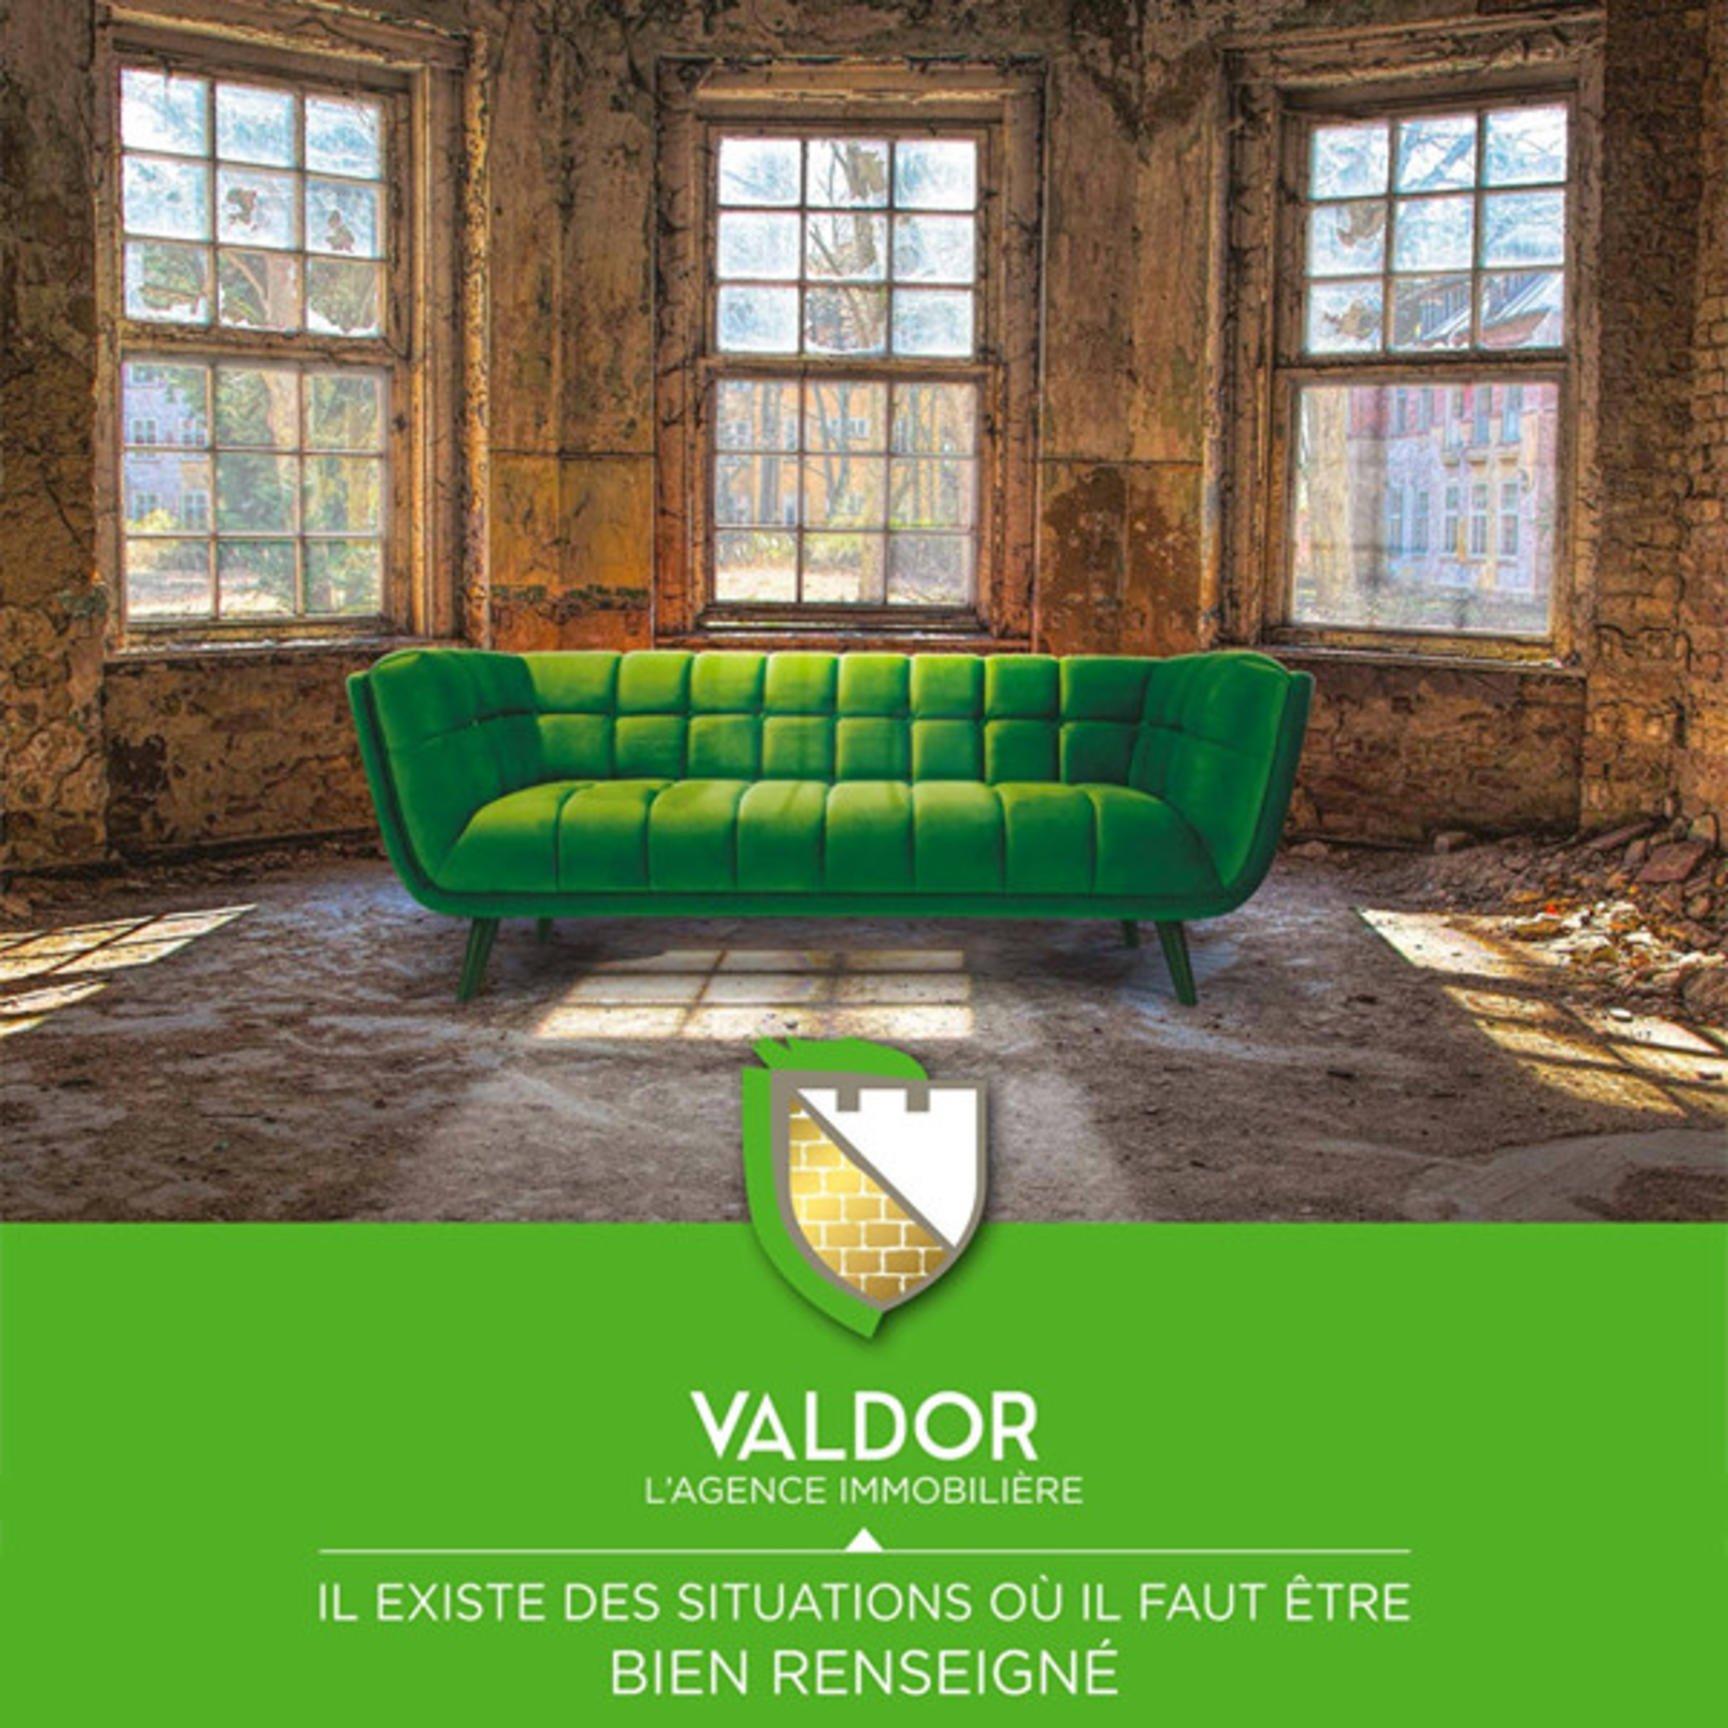 Valdor L'agence Immobilière Anse